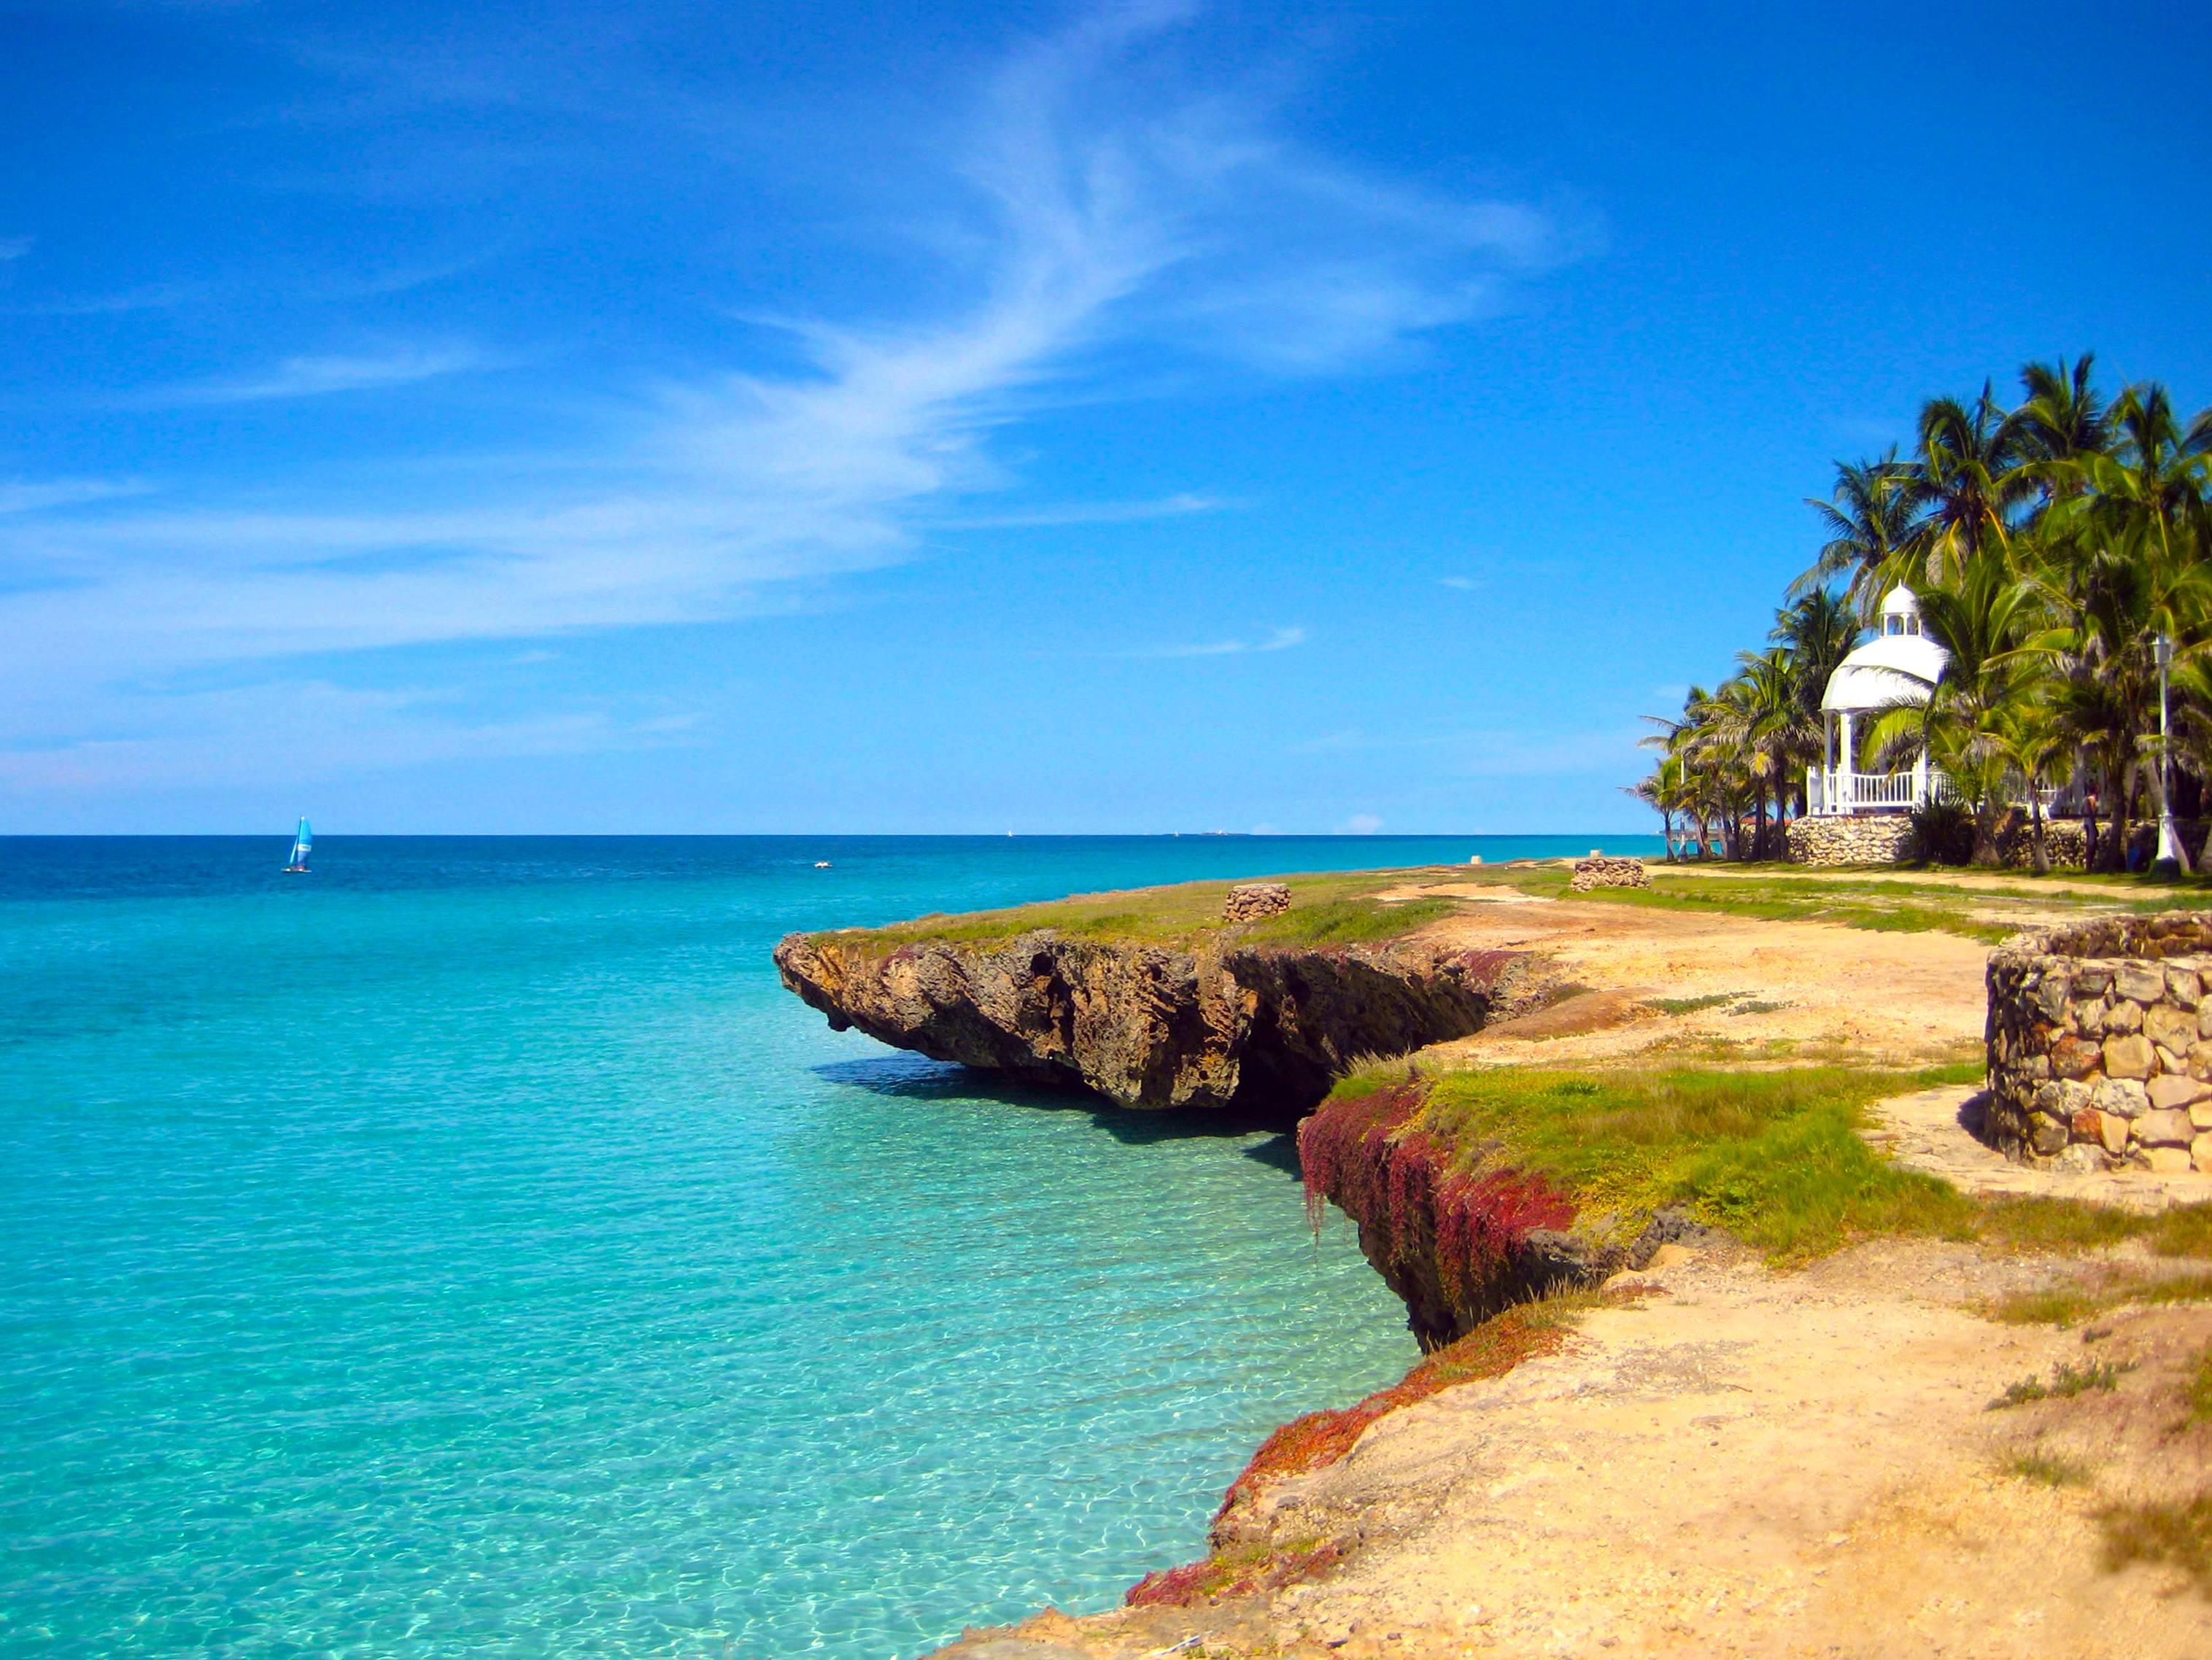 Download wallpaper caribbean beach Hotel desktop wallpaper 3032x2276